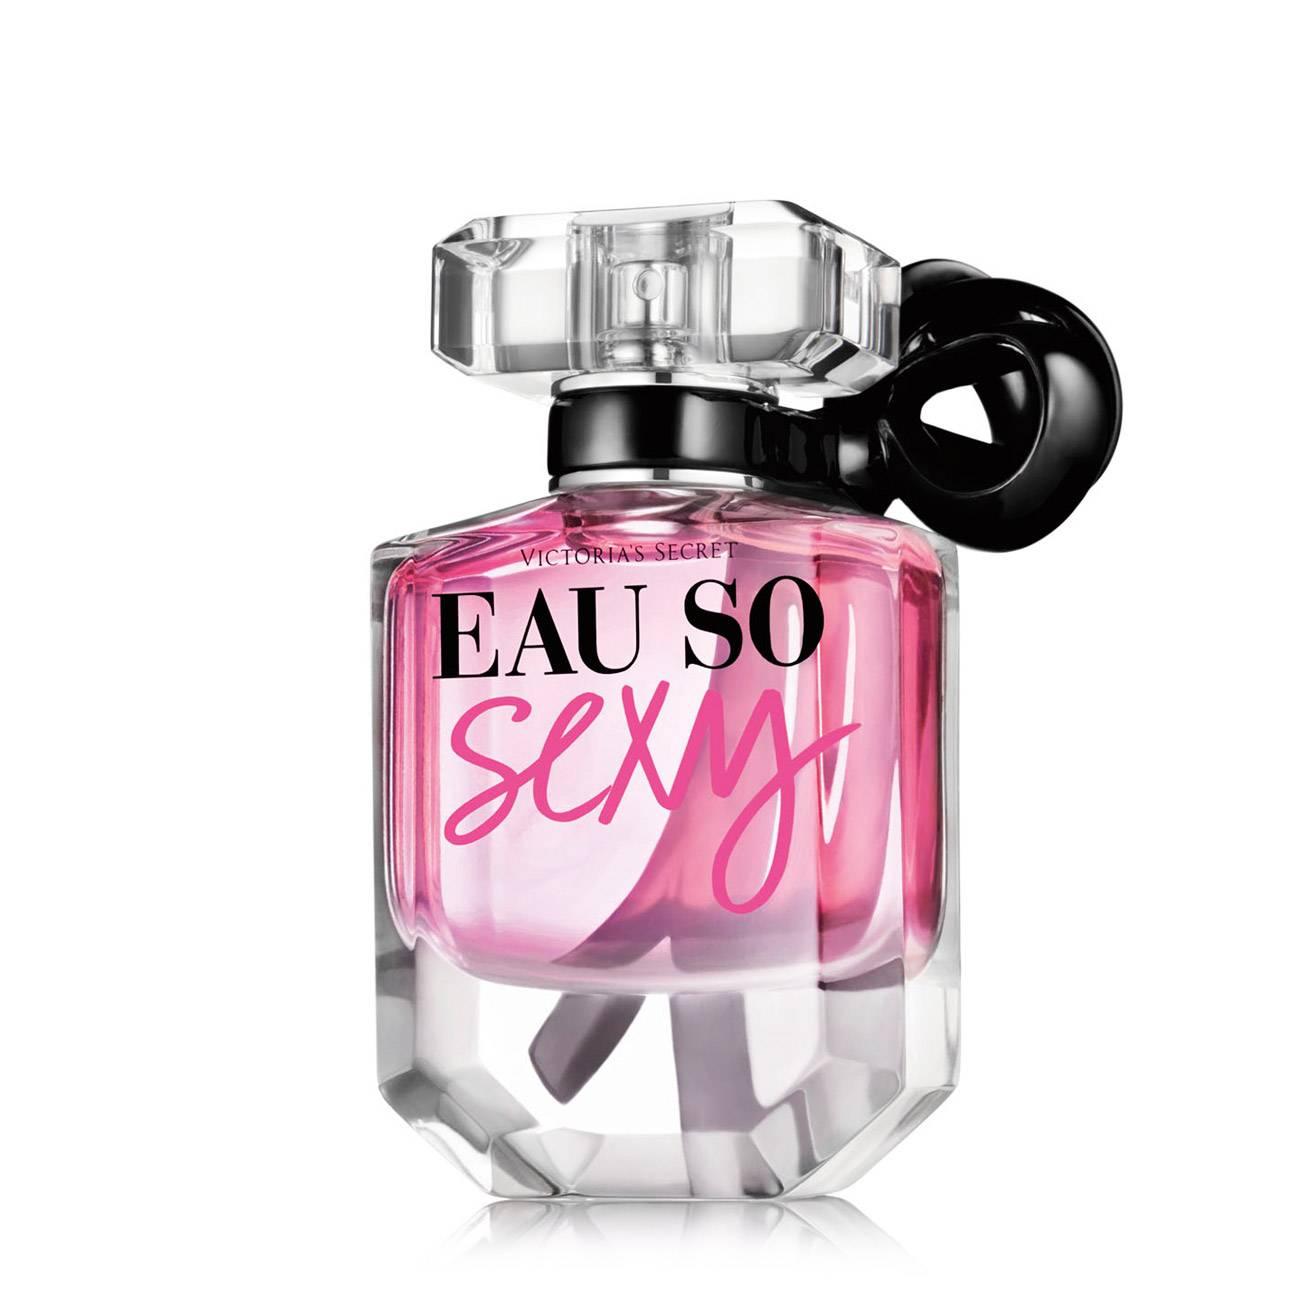 Eau So Sexy 100ml imagine